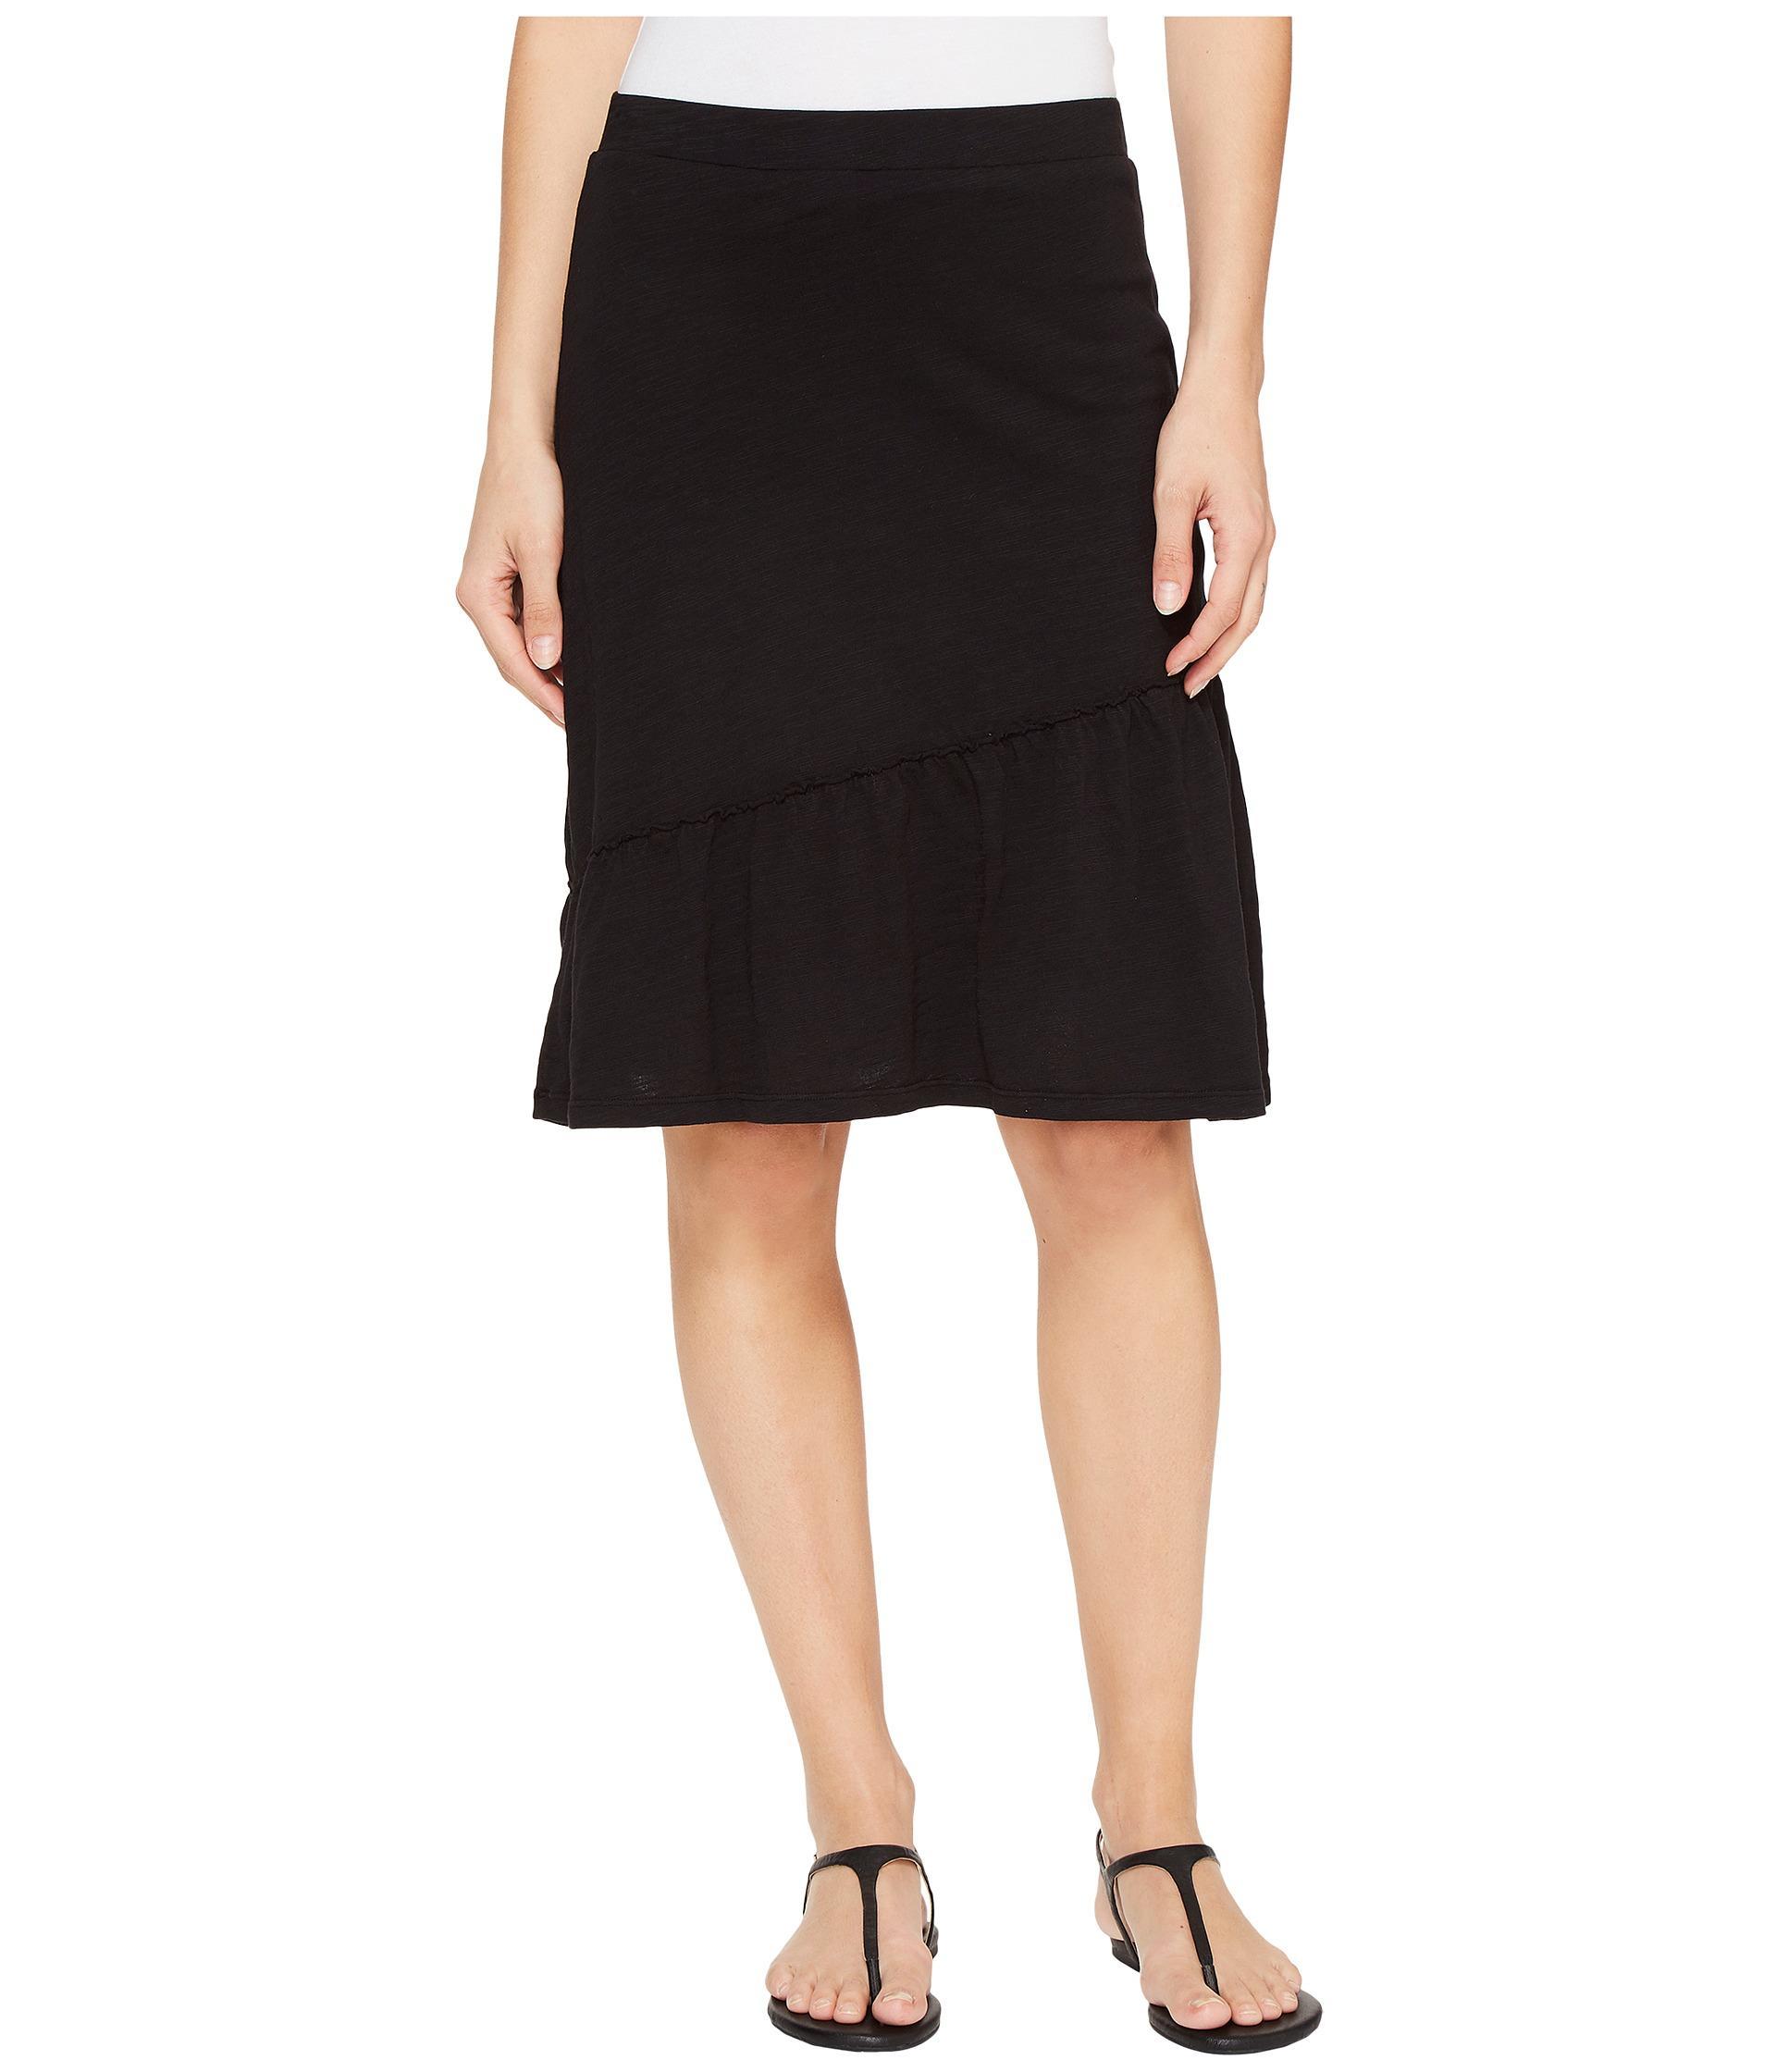 Navy jersey dress w/crossover v-neckline, royal blue & black re-embroidered lace short sleeves, slightly flared skirt w/v-notch at left knee | Vanna White's dresses | Wheel of .